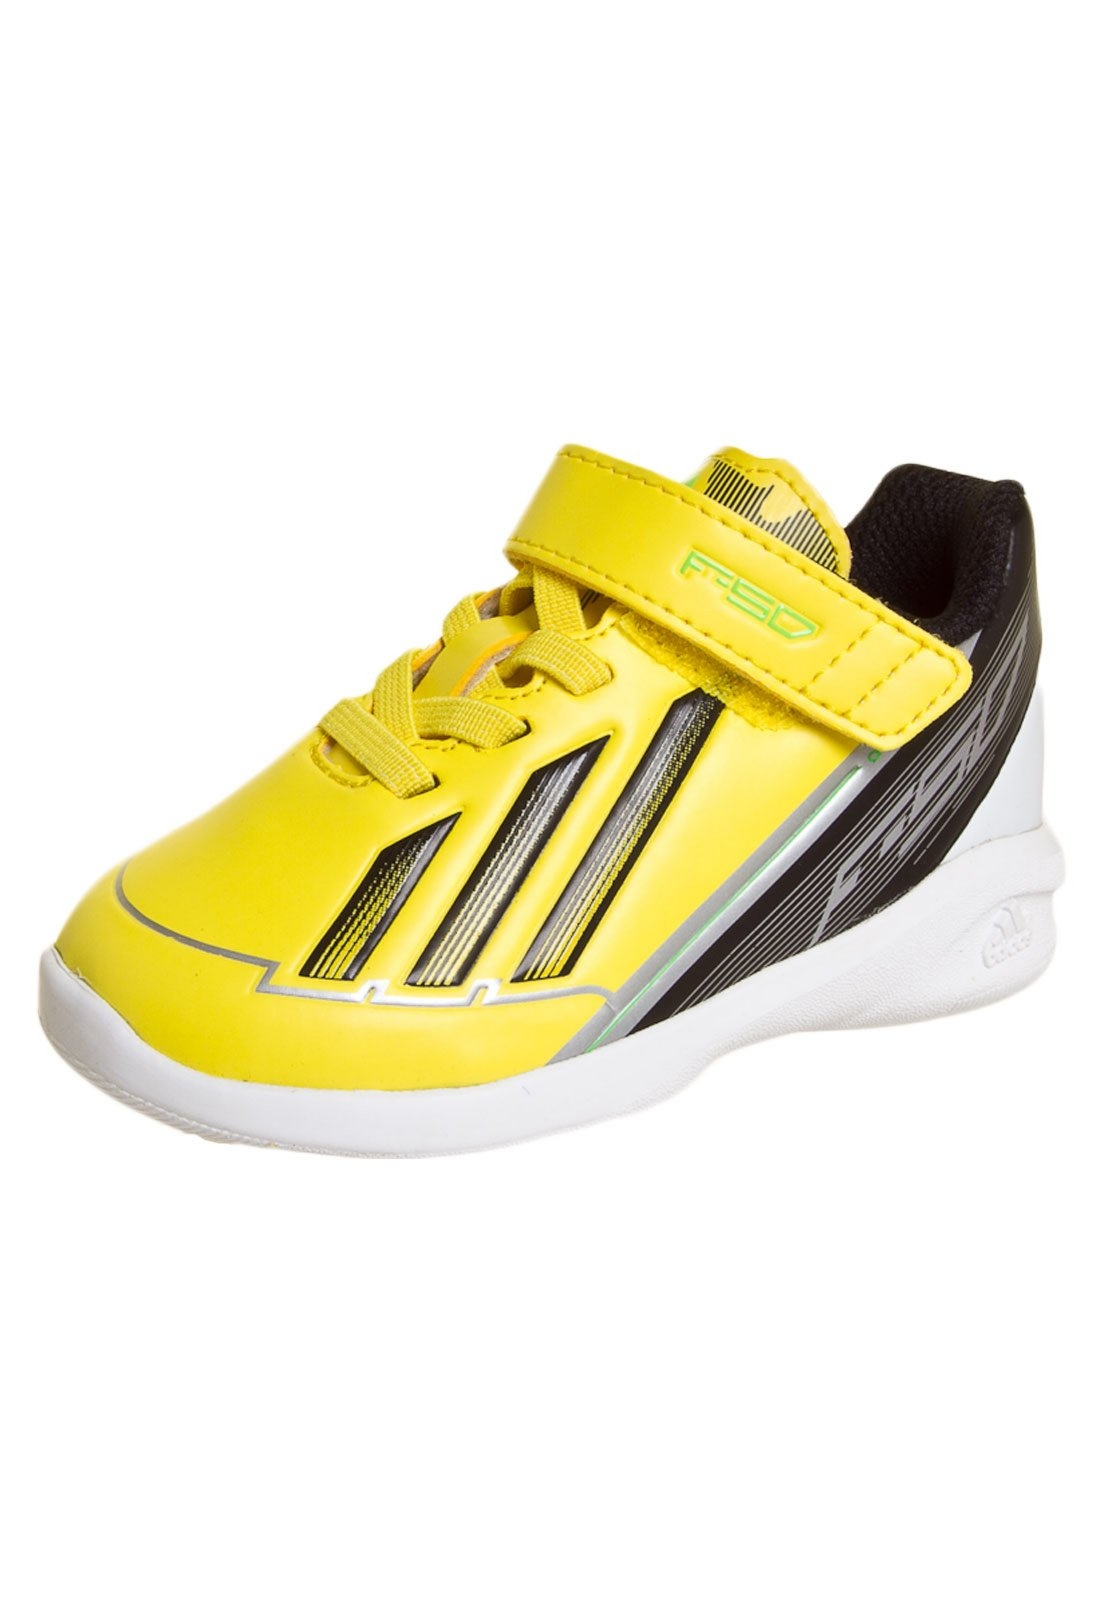 perjudicar Tahití Grafico  Tênis adidas F50 Adizero Cf Infantil Amarelo - Compre Agora   Kanui Brasil